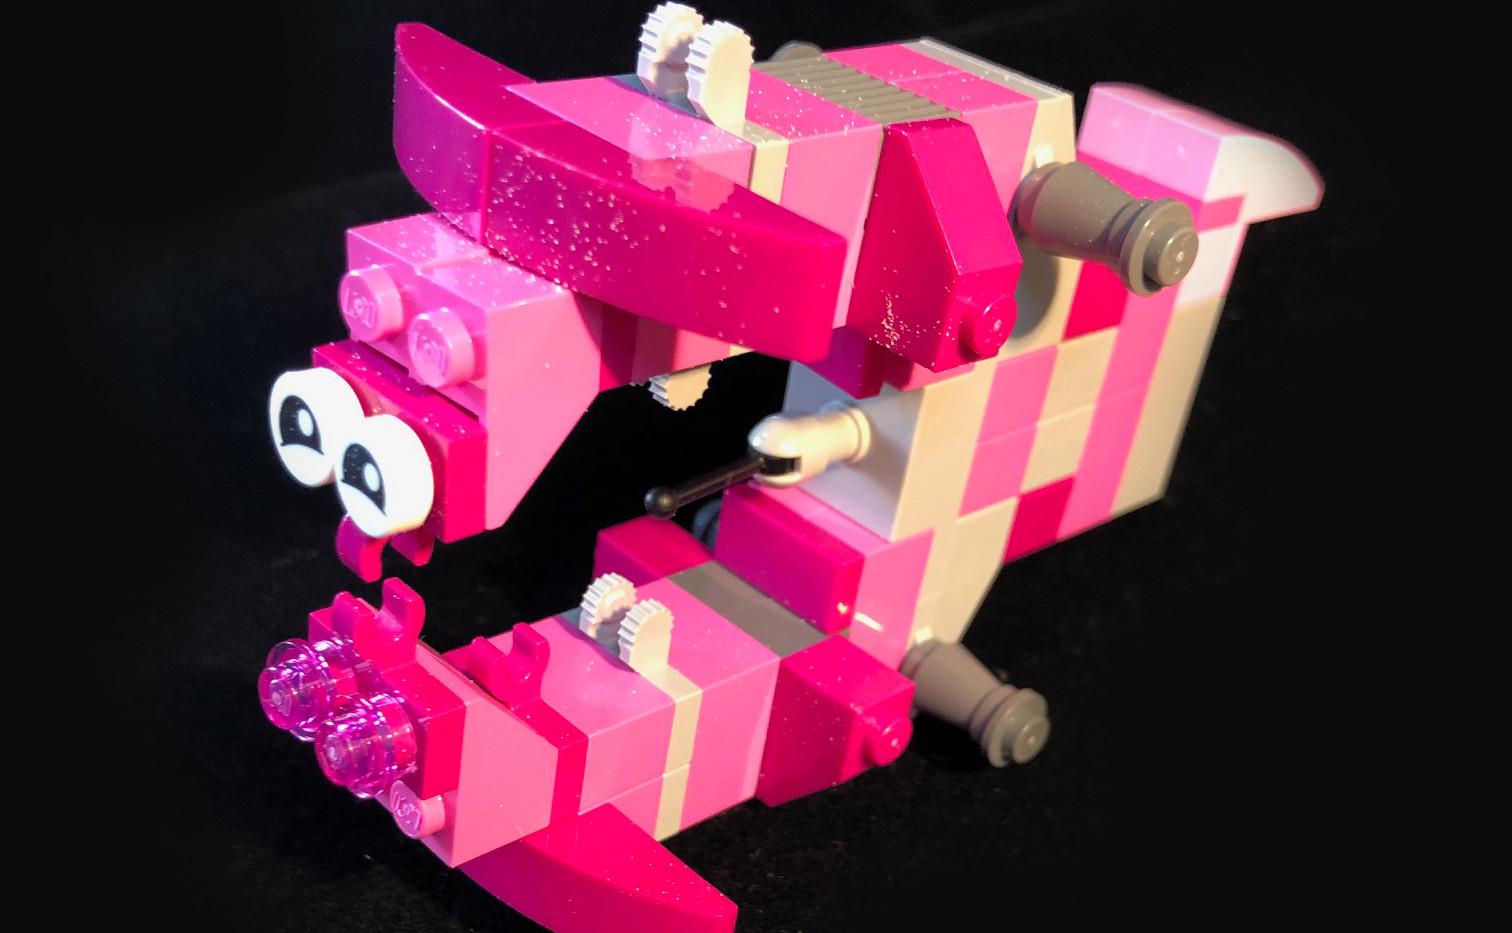 LEtitGO--Pink Dory Fish by Thomas Moraitis